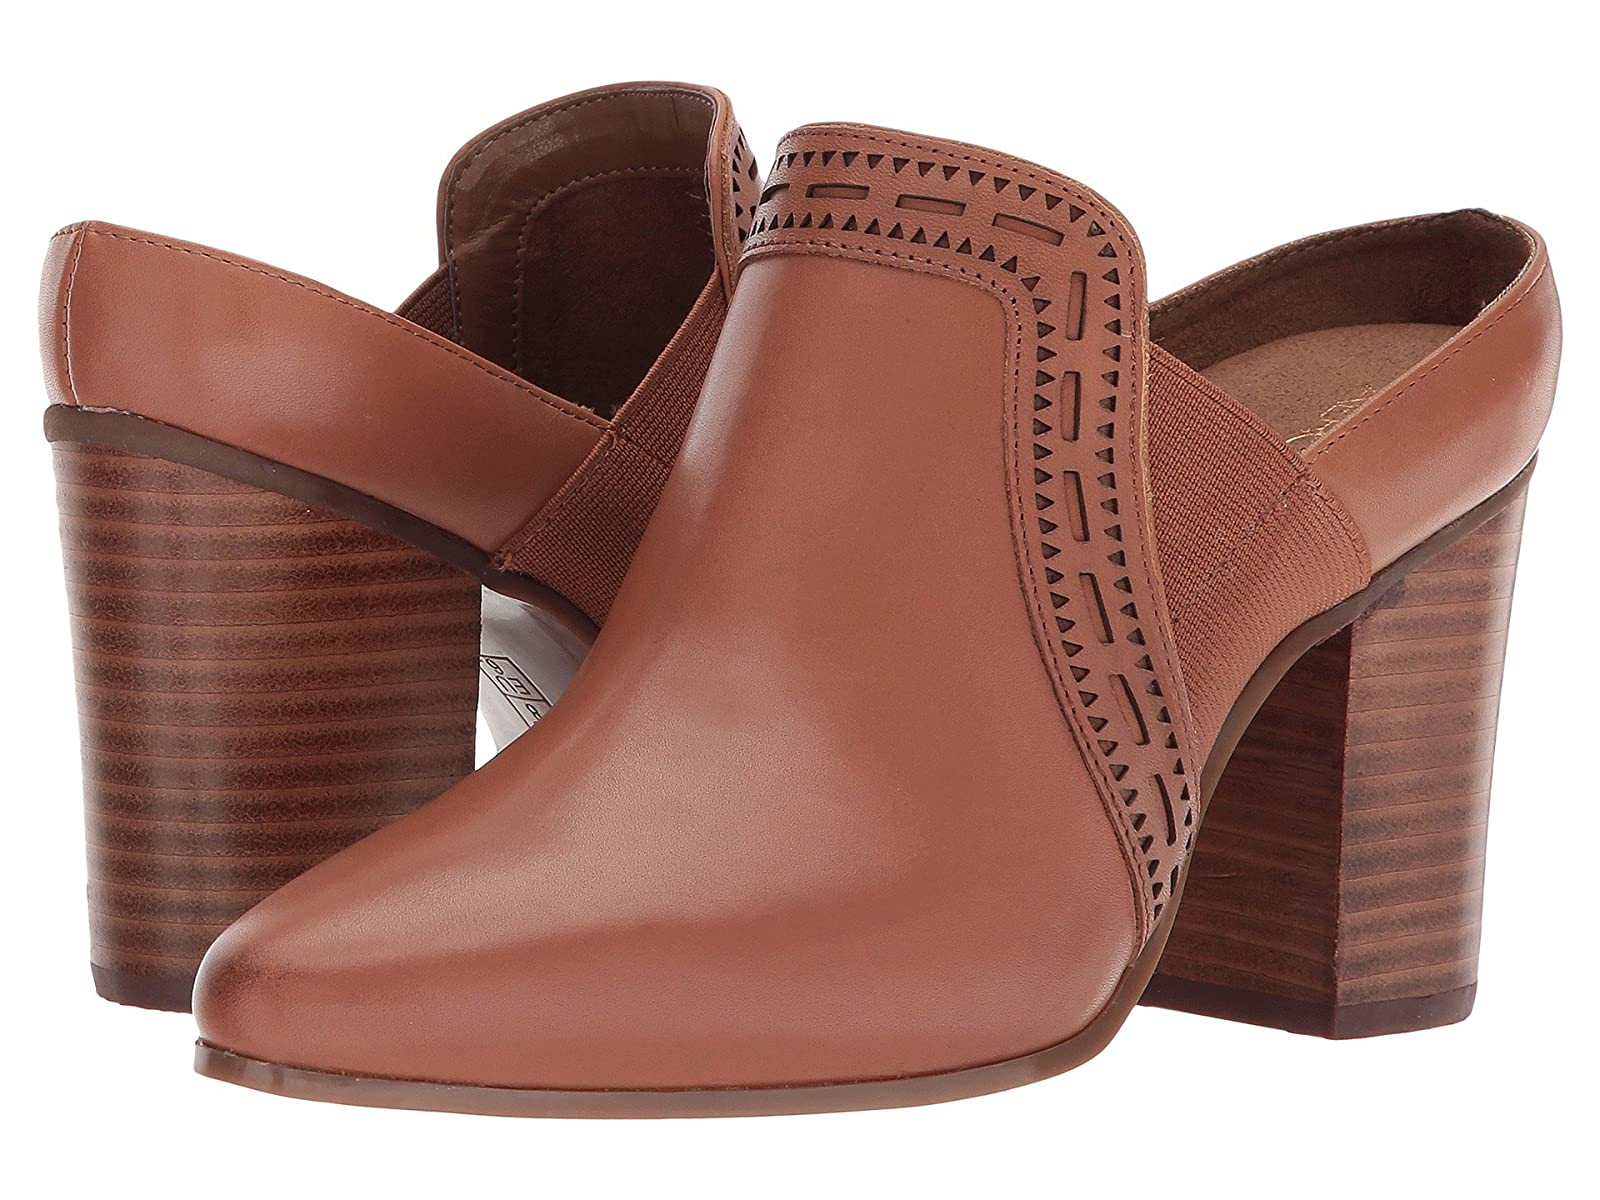 Aerosoles Pocket SquareCheap and distinctive eye-catching shoes